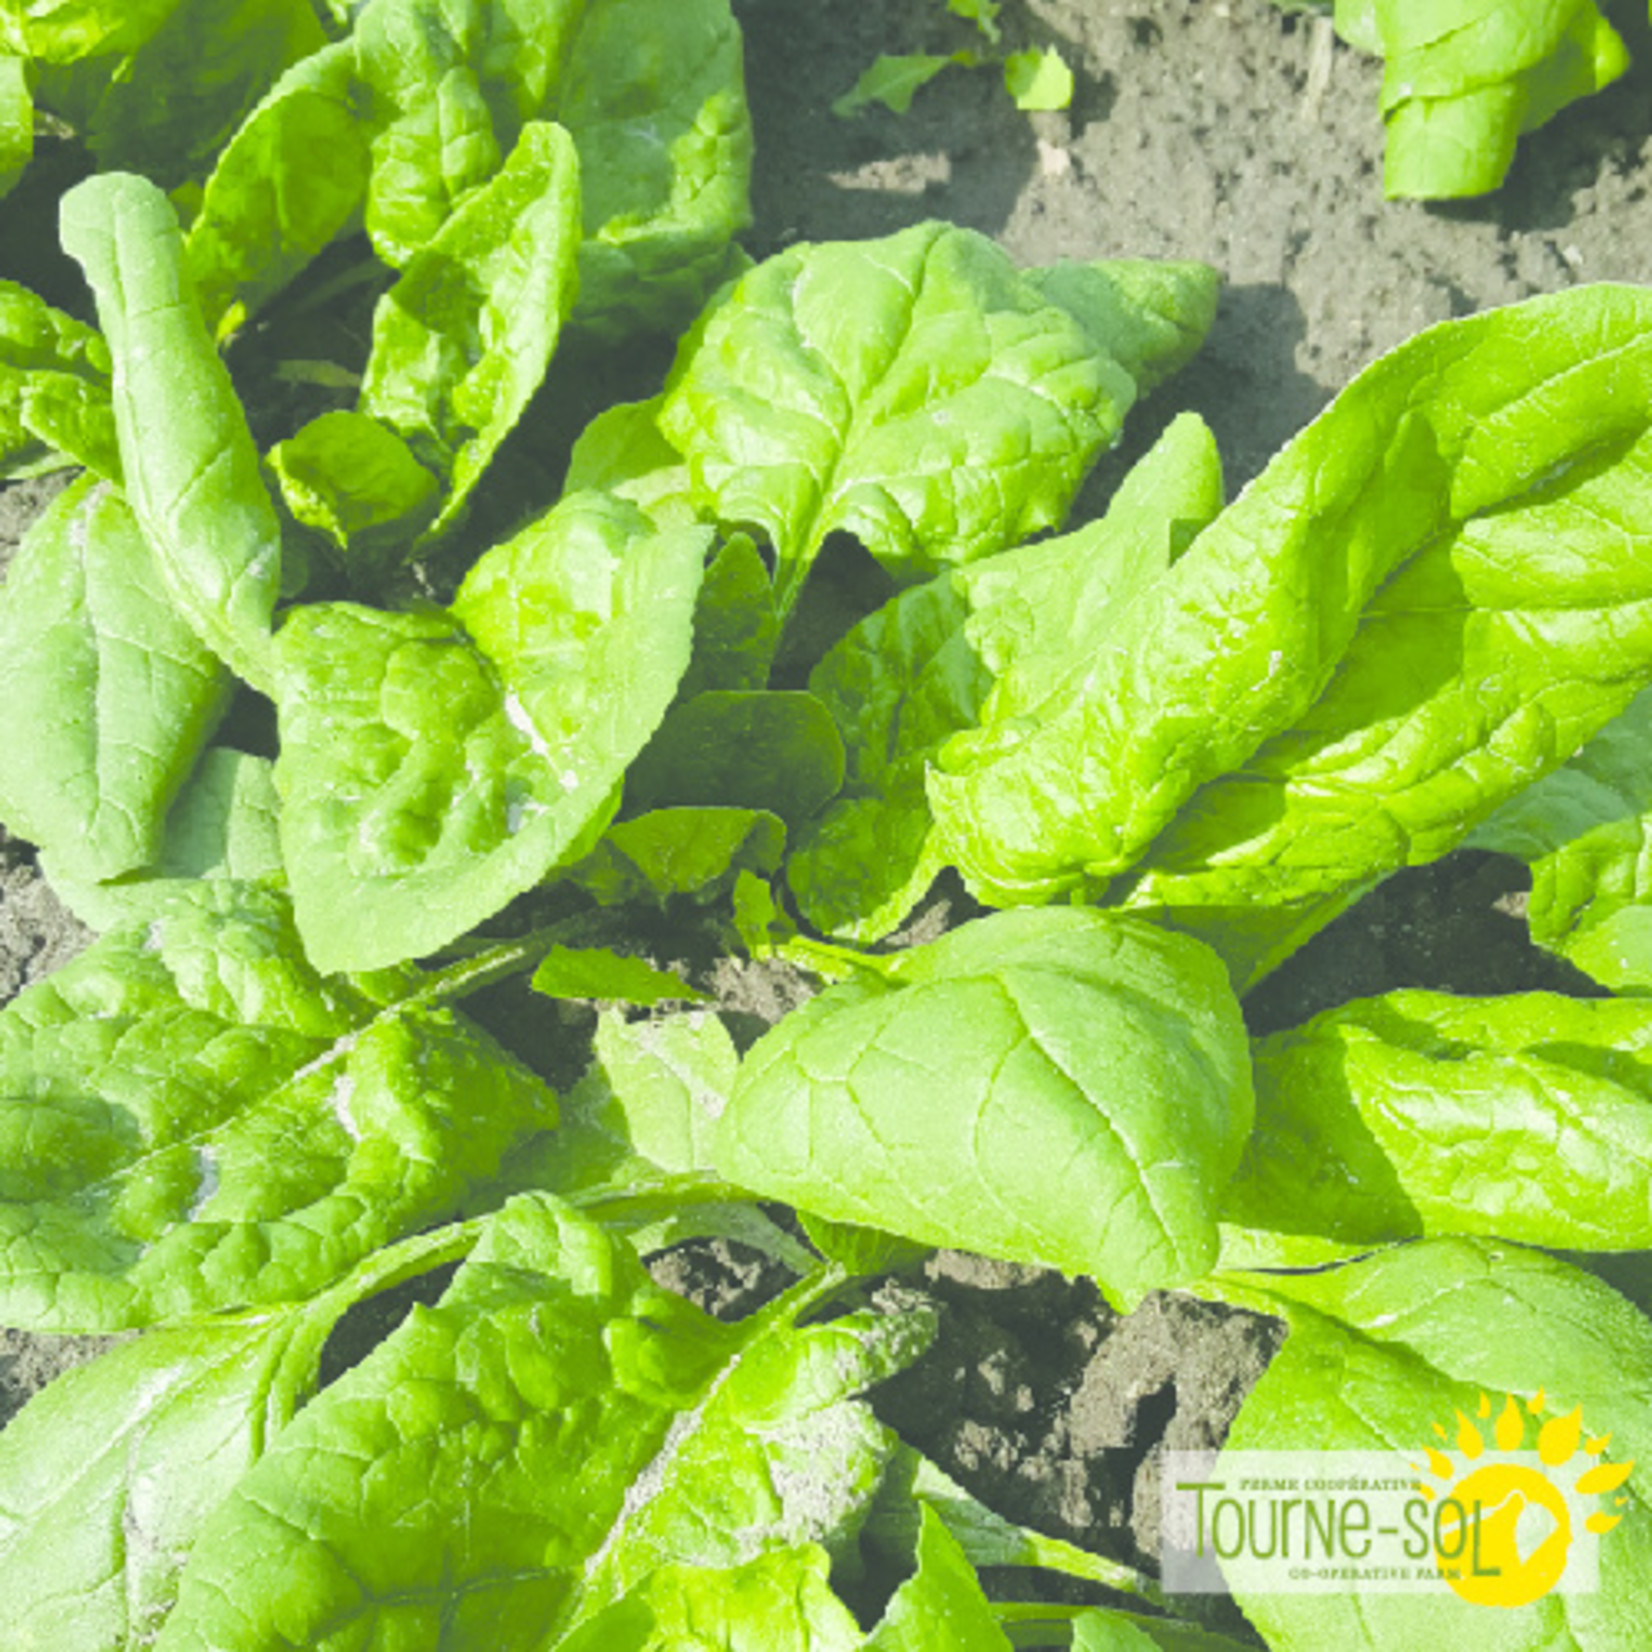 Tourne-Sol Verdil spinach